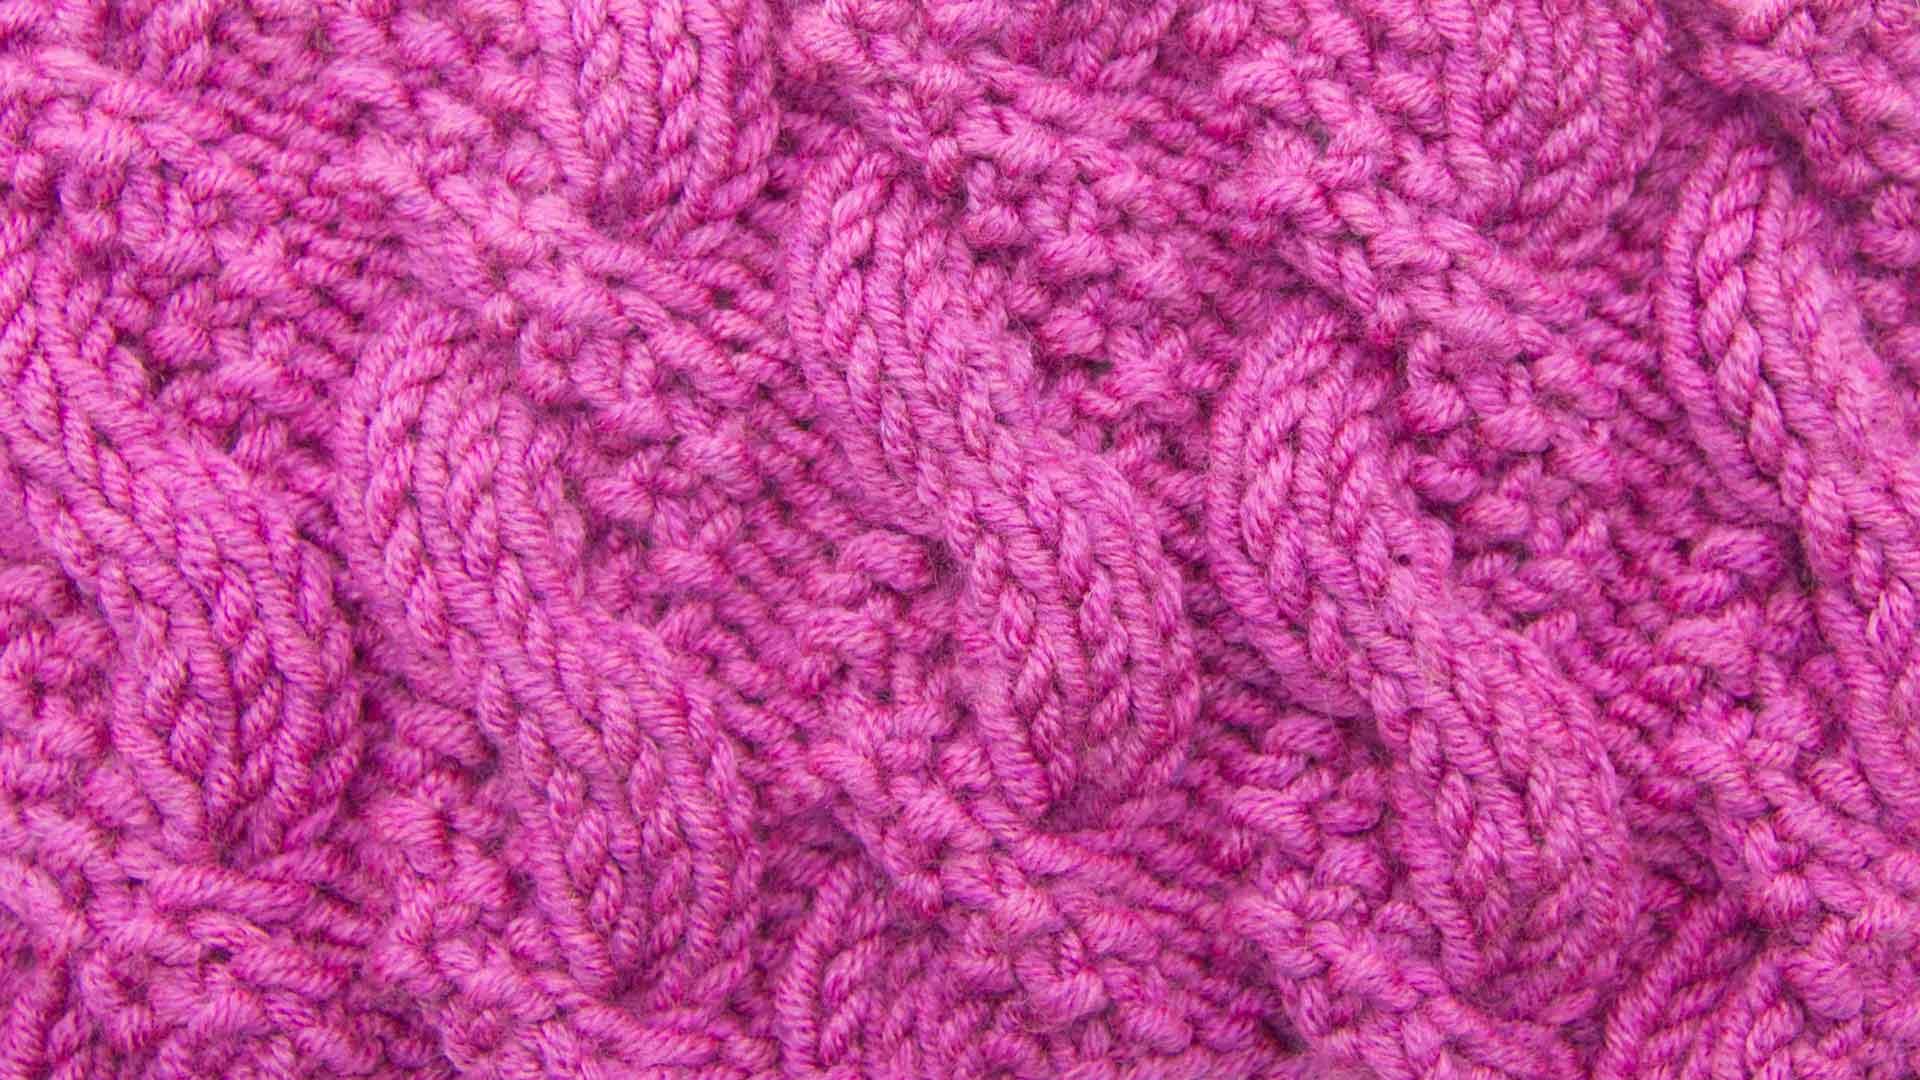 knitting stitches the textured cable stitch :: knitting stitch #526 vdjbwmg